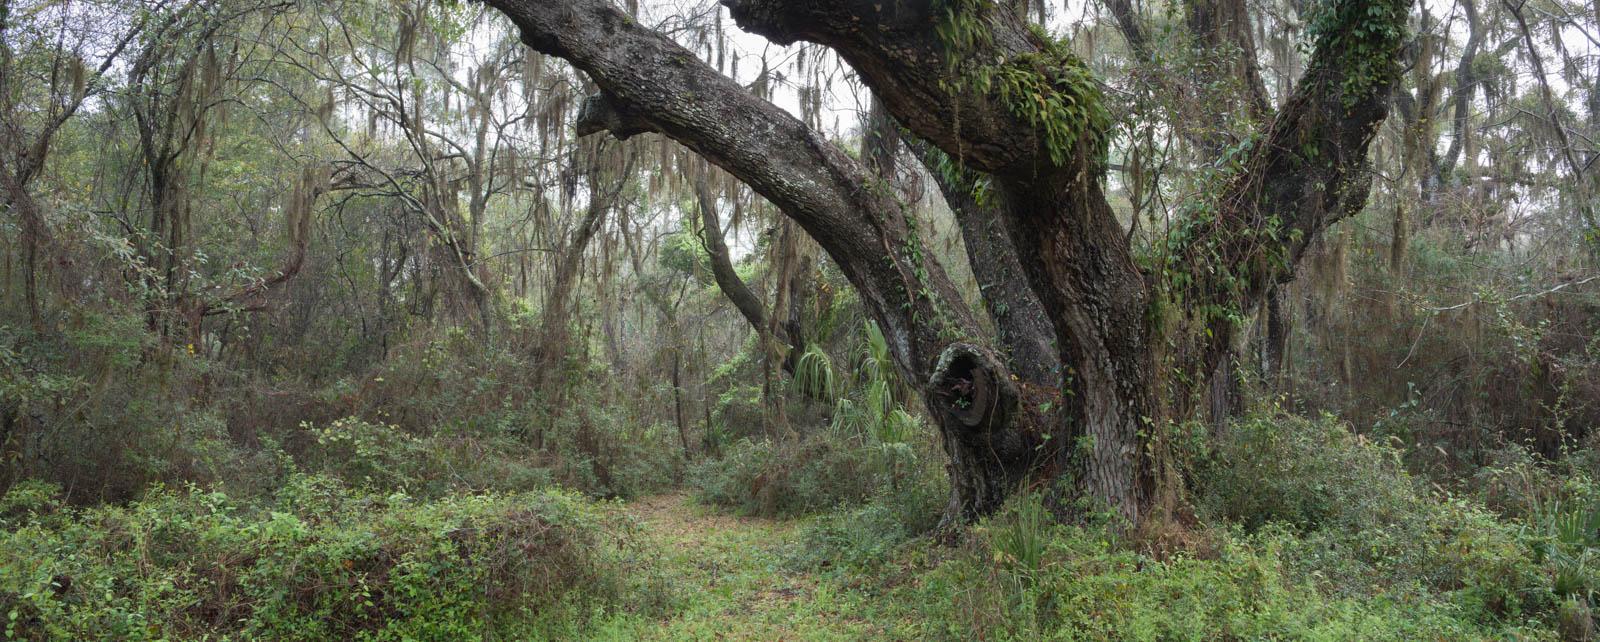 dauphin_island_goat_trees03-2